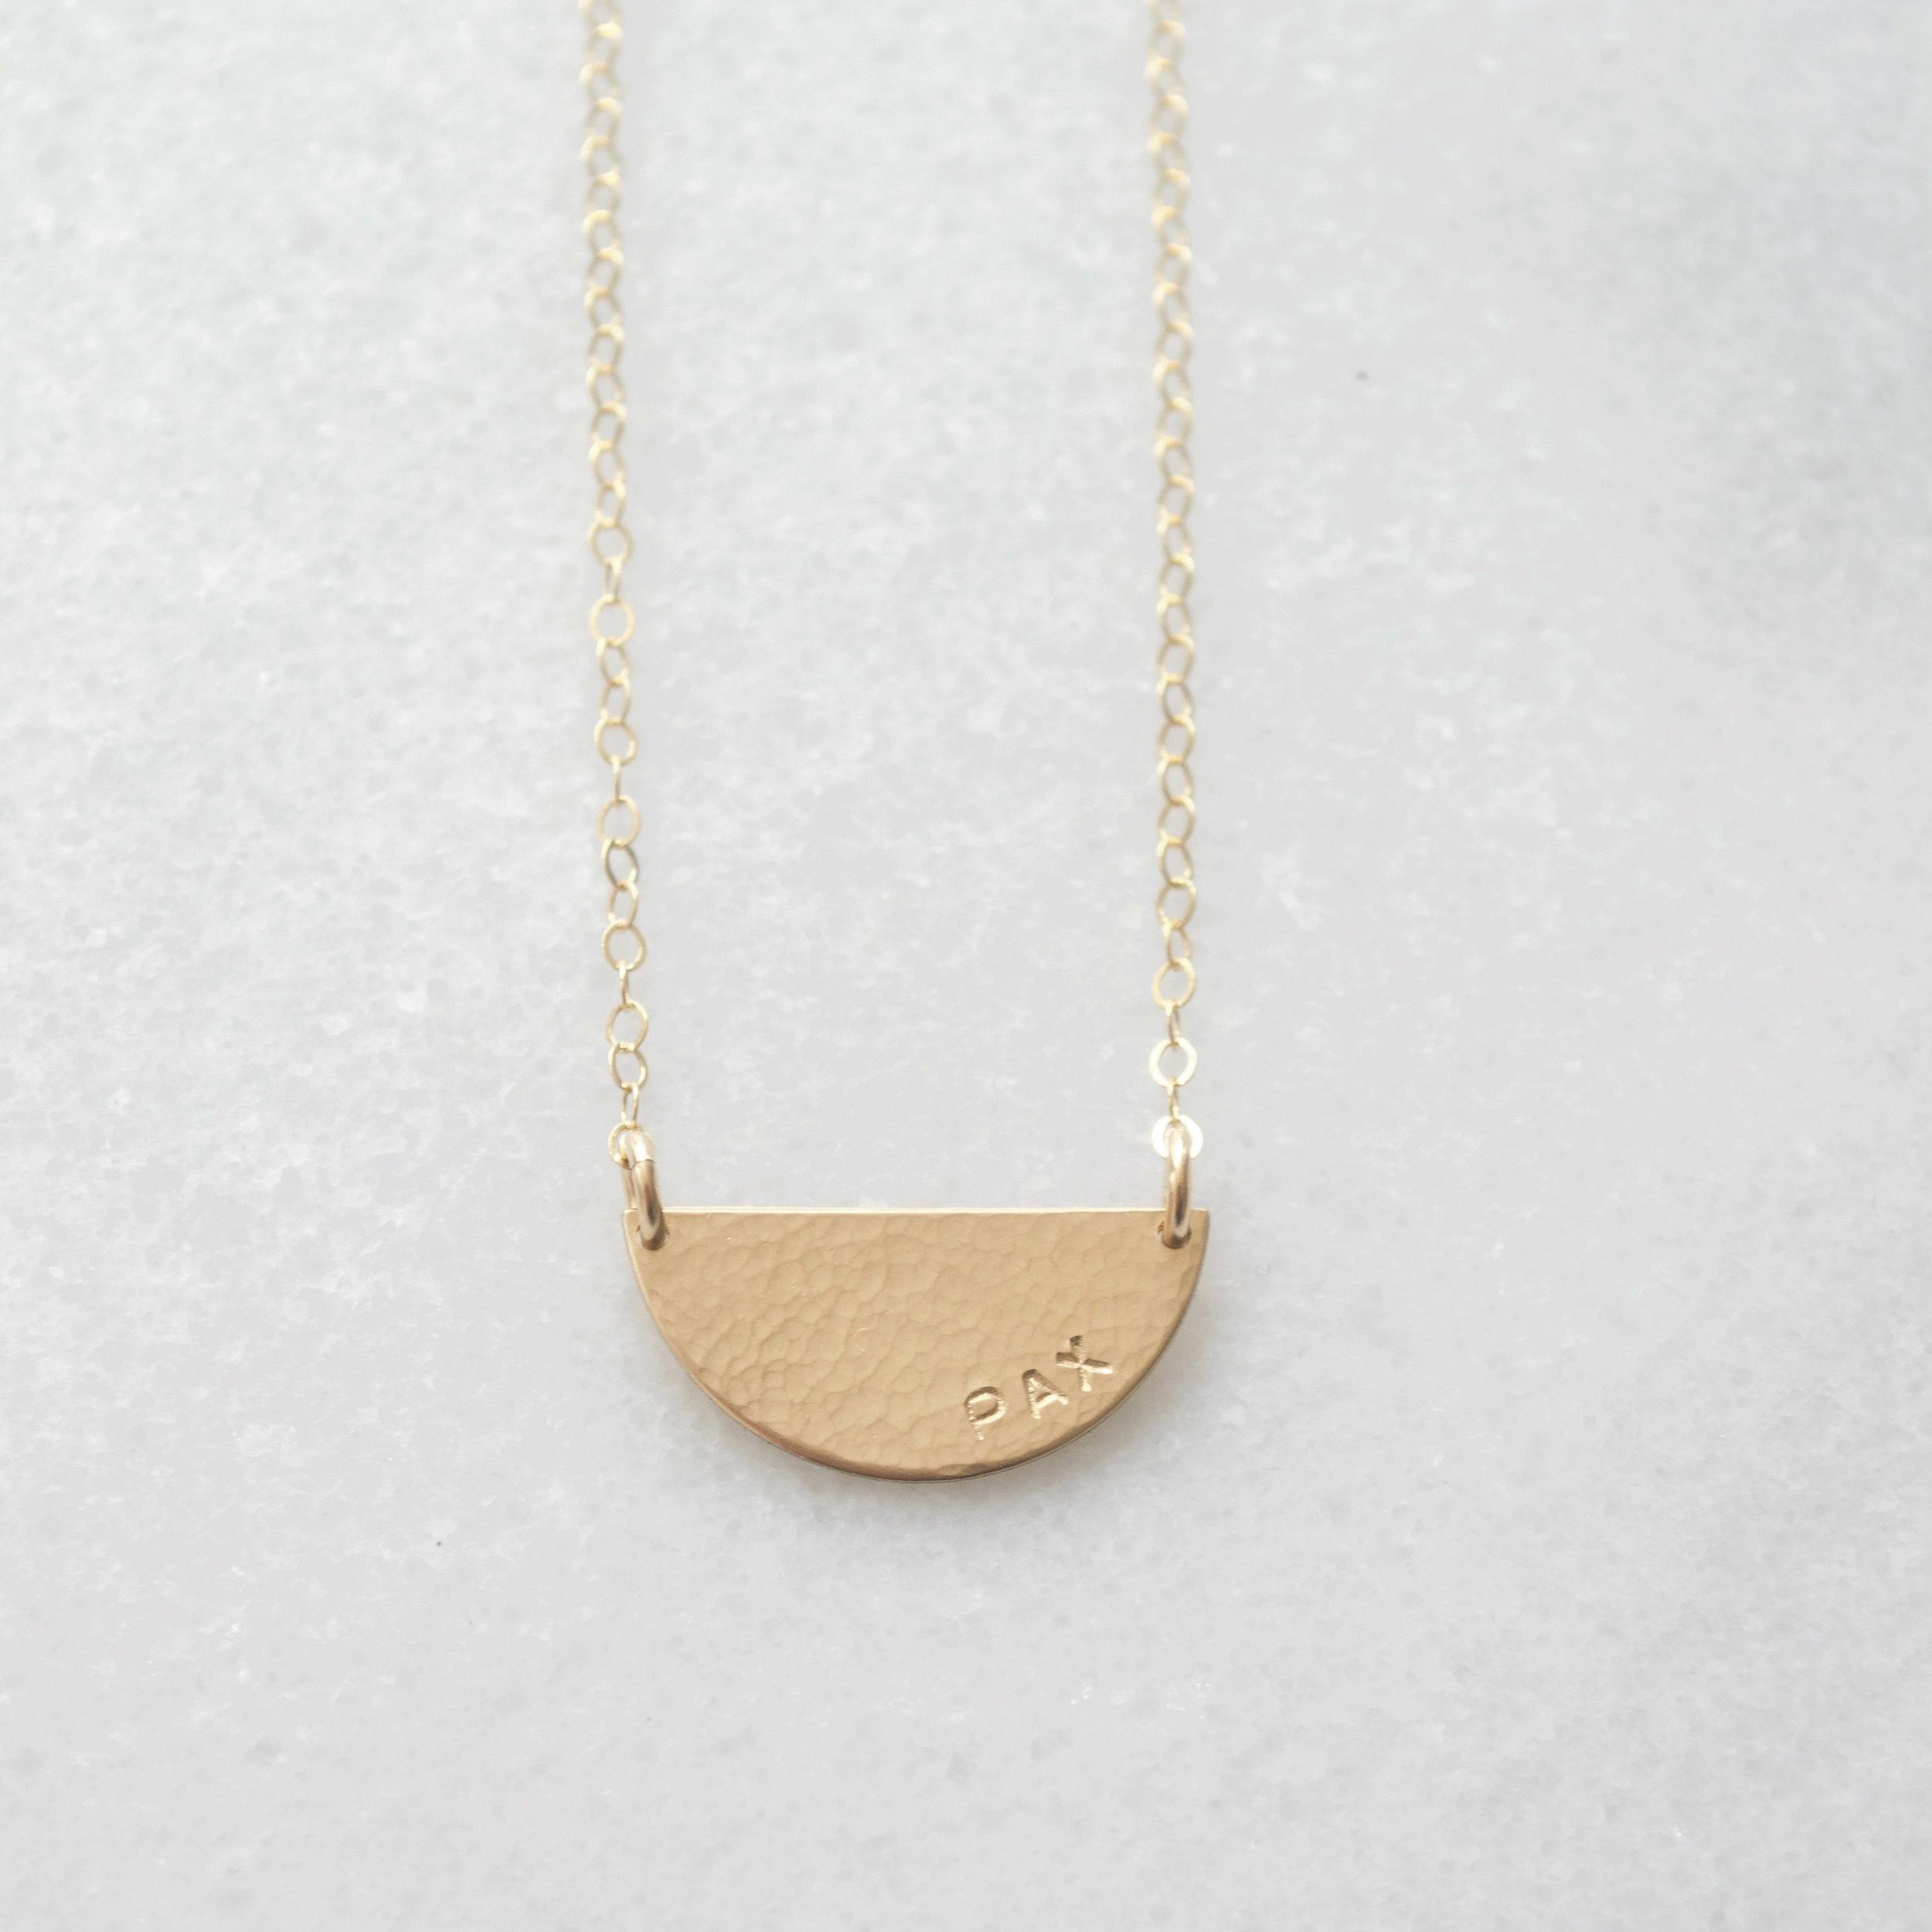 Hammered Half Moon Necklace